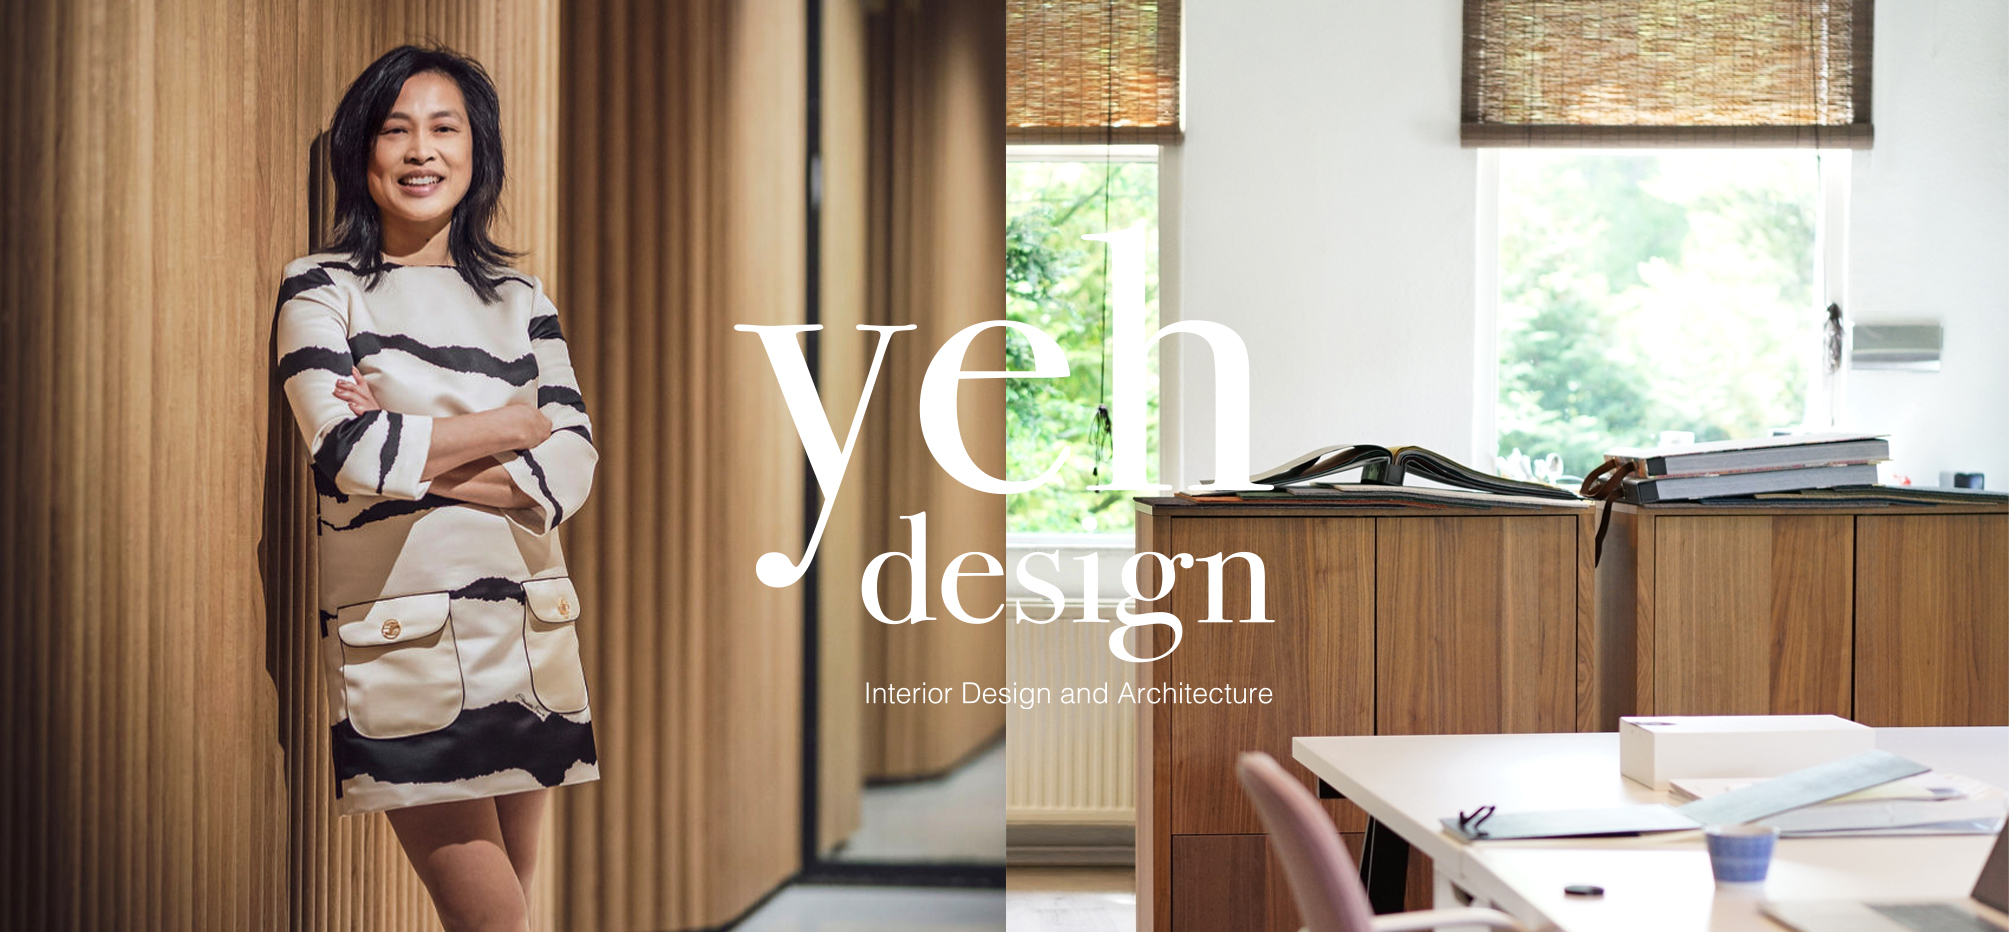 Yeh Design Interior Design And Architecture